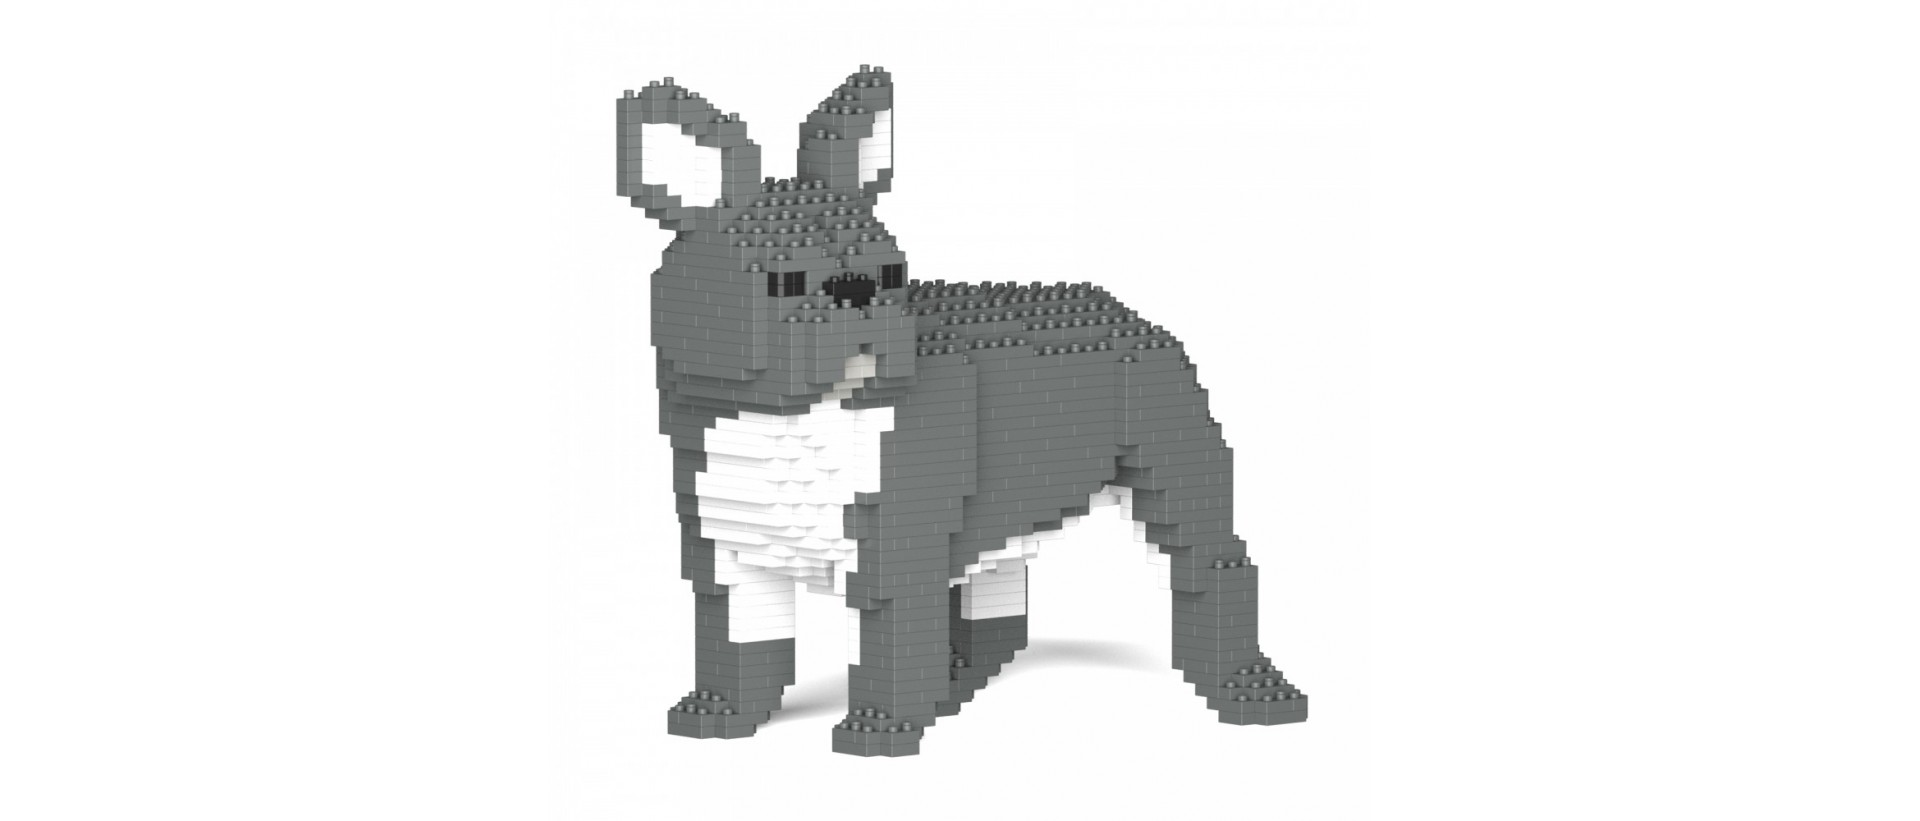 French Bulldog S03-M05